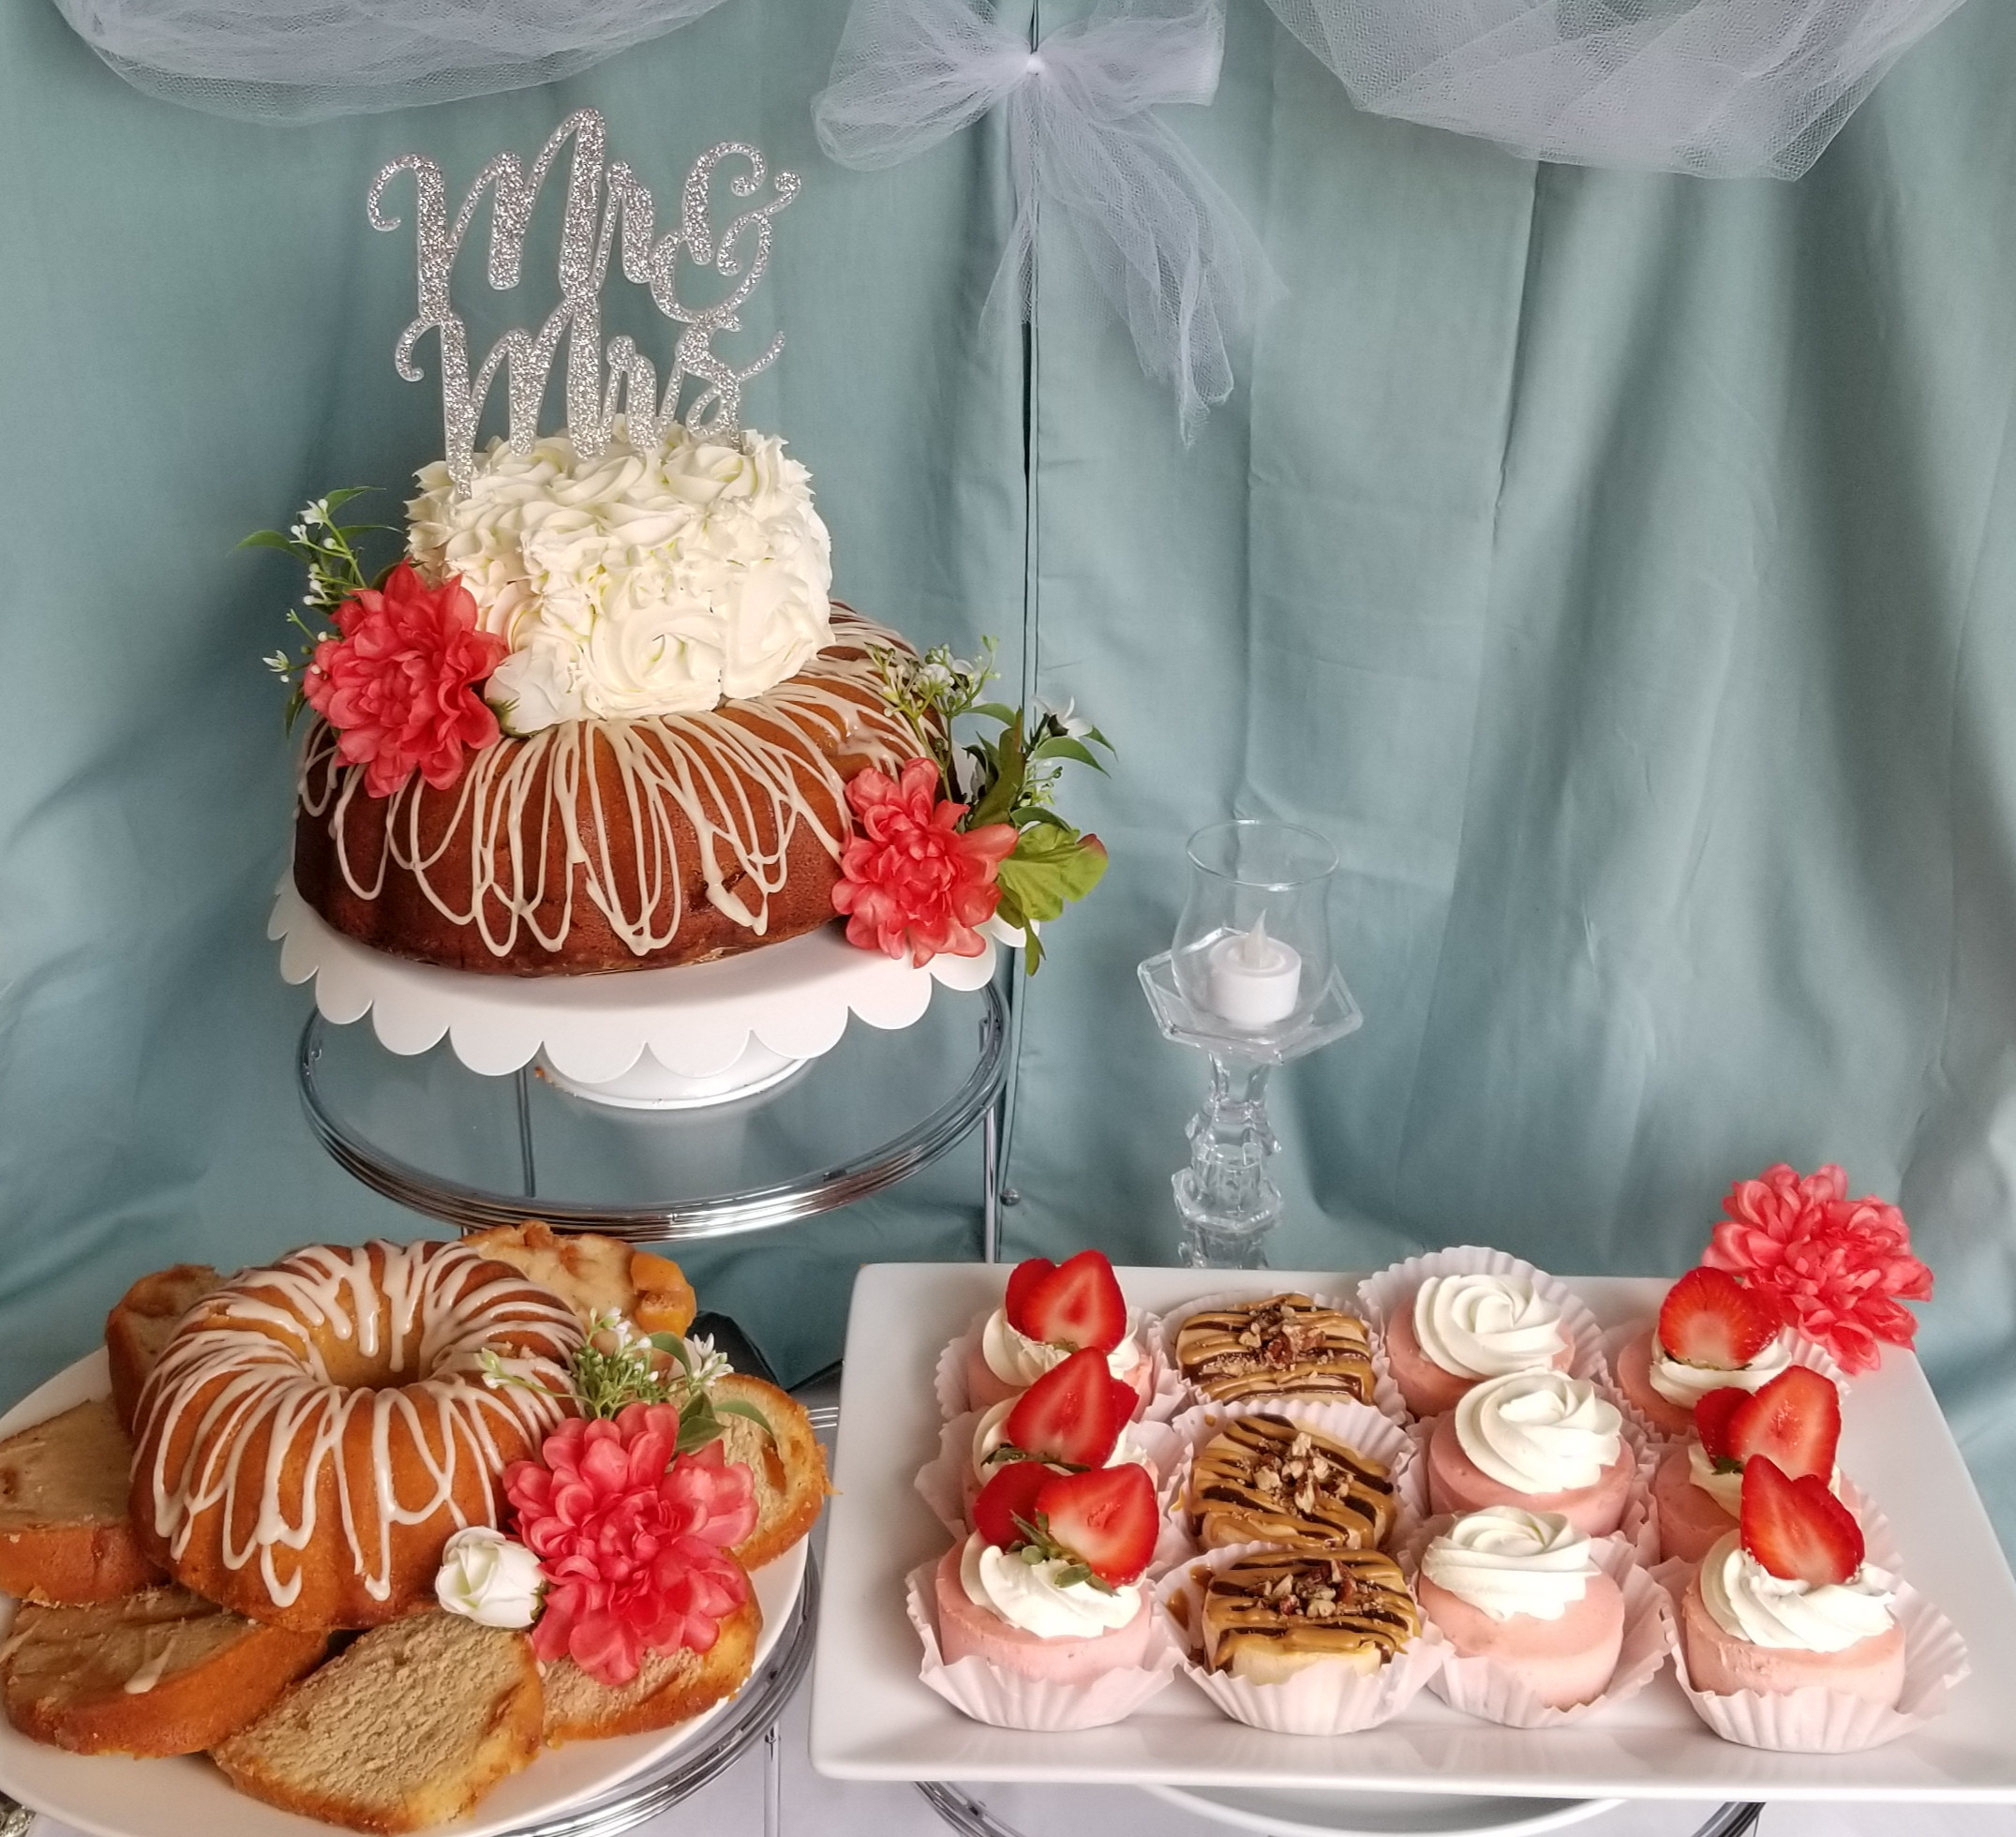 CBR Dessert Tables